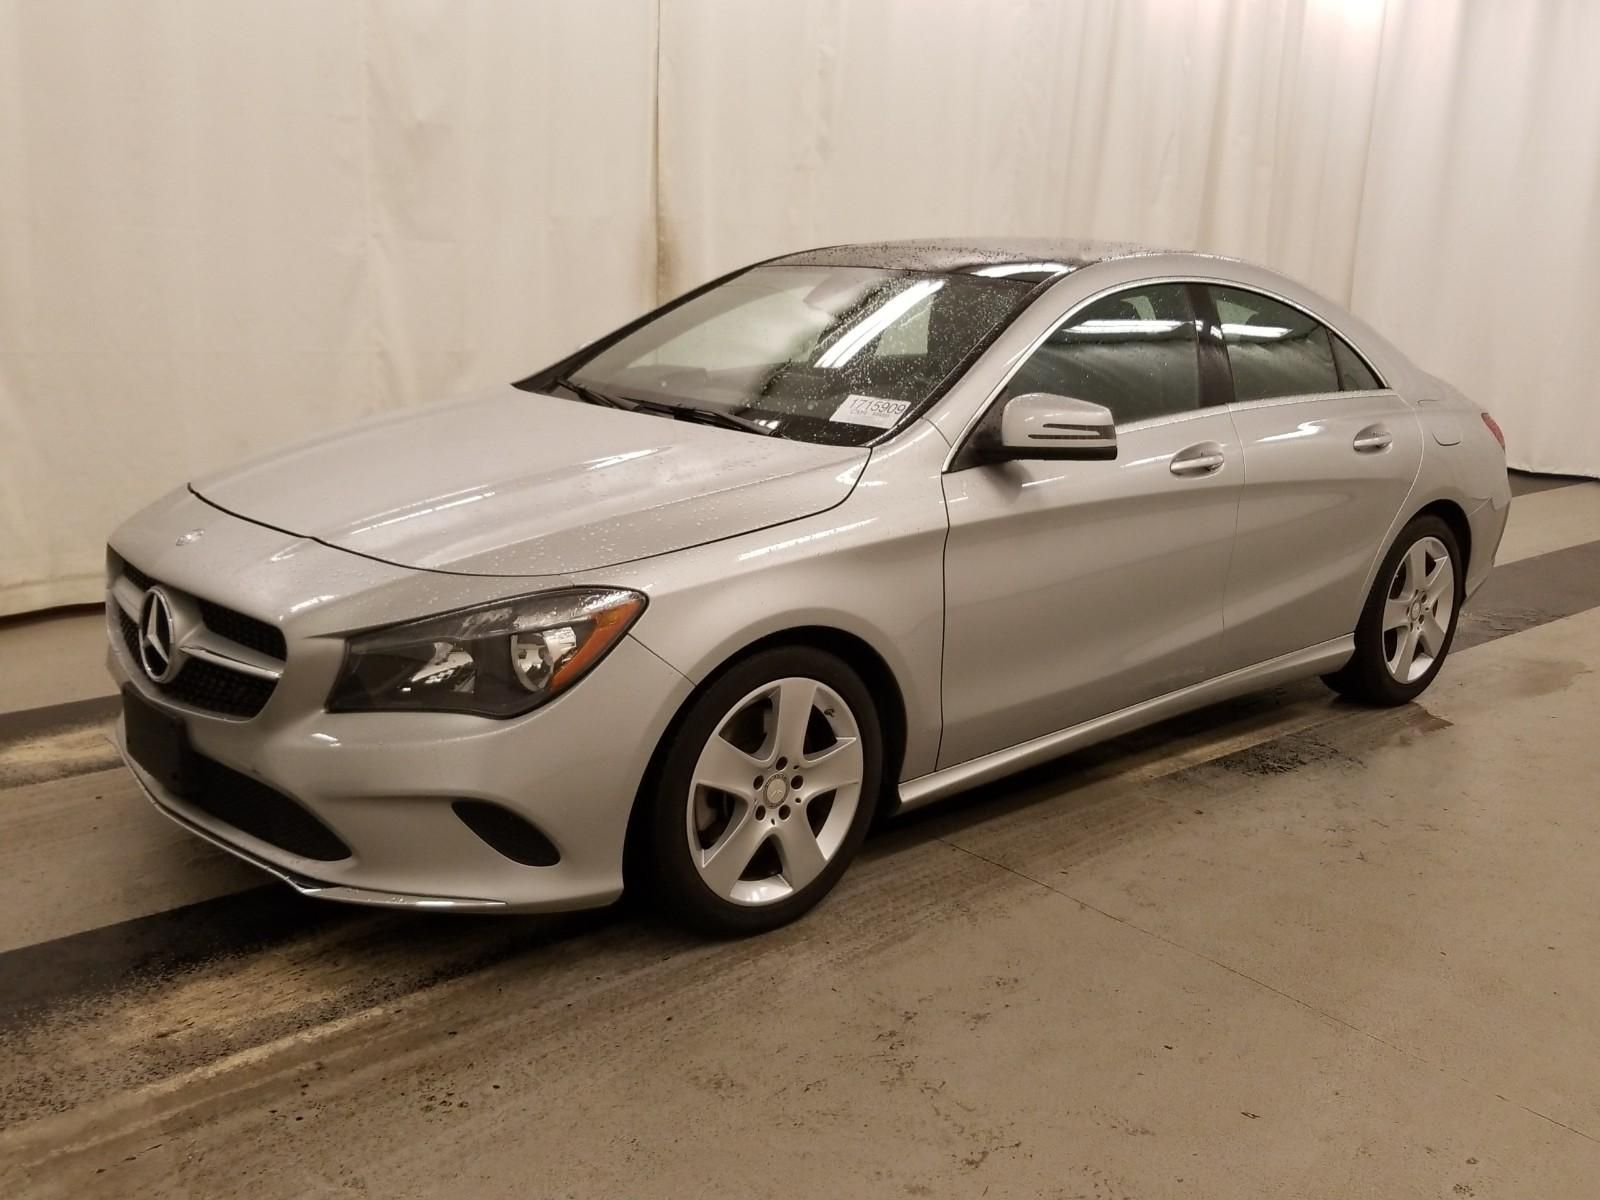 2017 Mercedes-benz Cla 2.0. Lot 99912175963 Vin WDDSJ4EB4HN465666